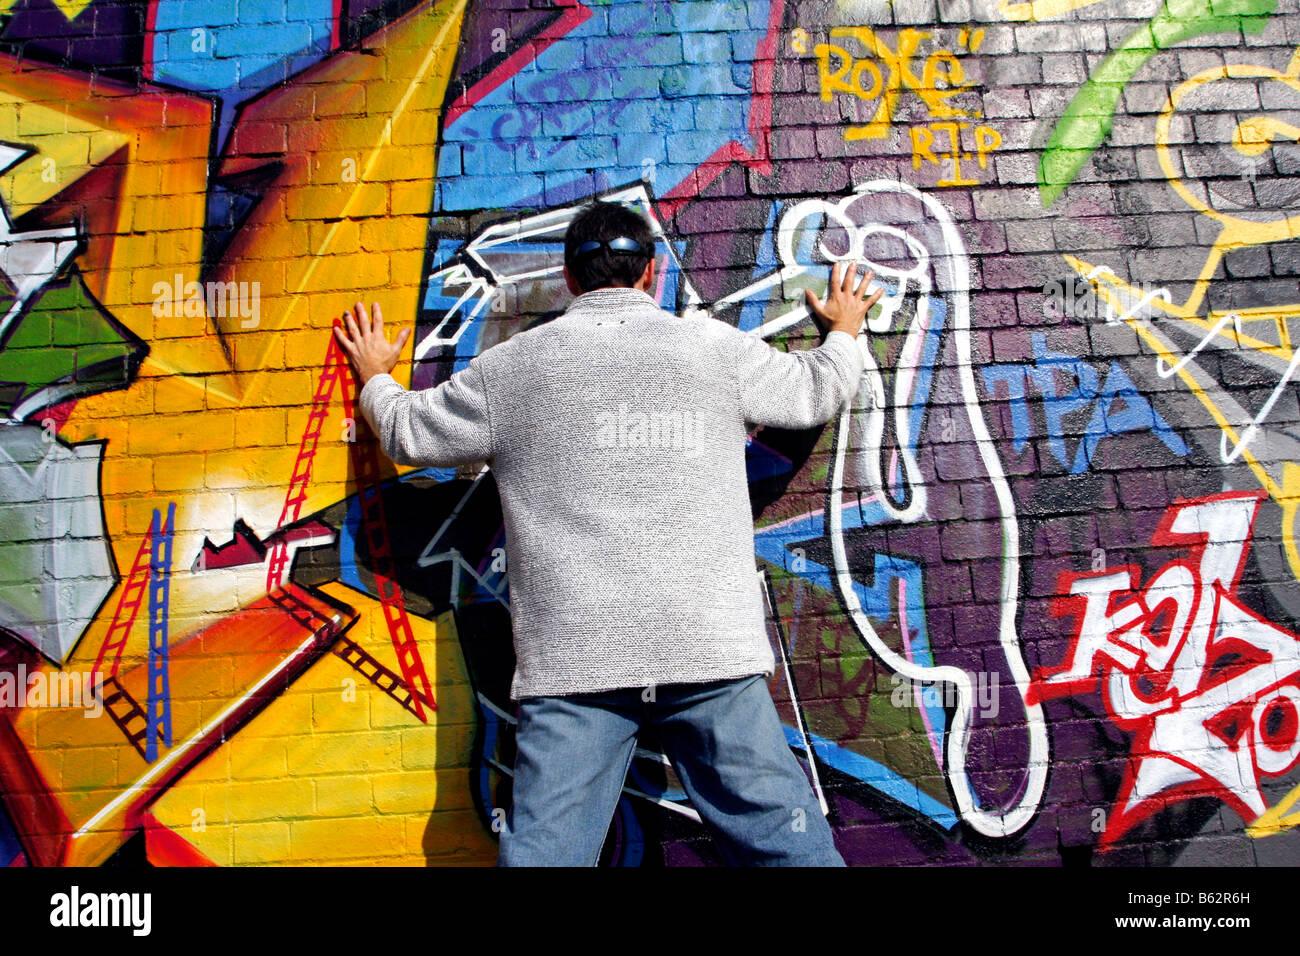 Graffiti wall painting - Stock Photo Brick Painting Spray Paint Train Commuter Valley Graffiti On The Wall Below A Railway Line Art Wallart Community Project Network